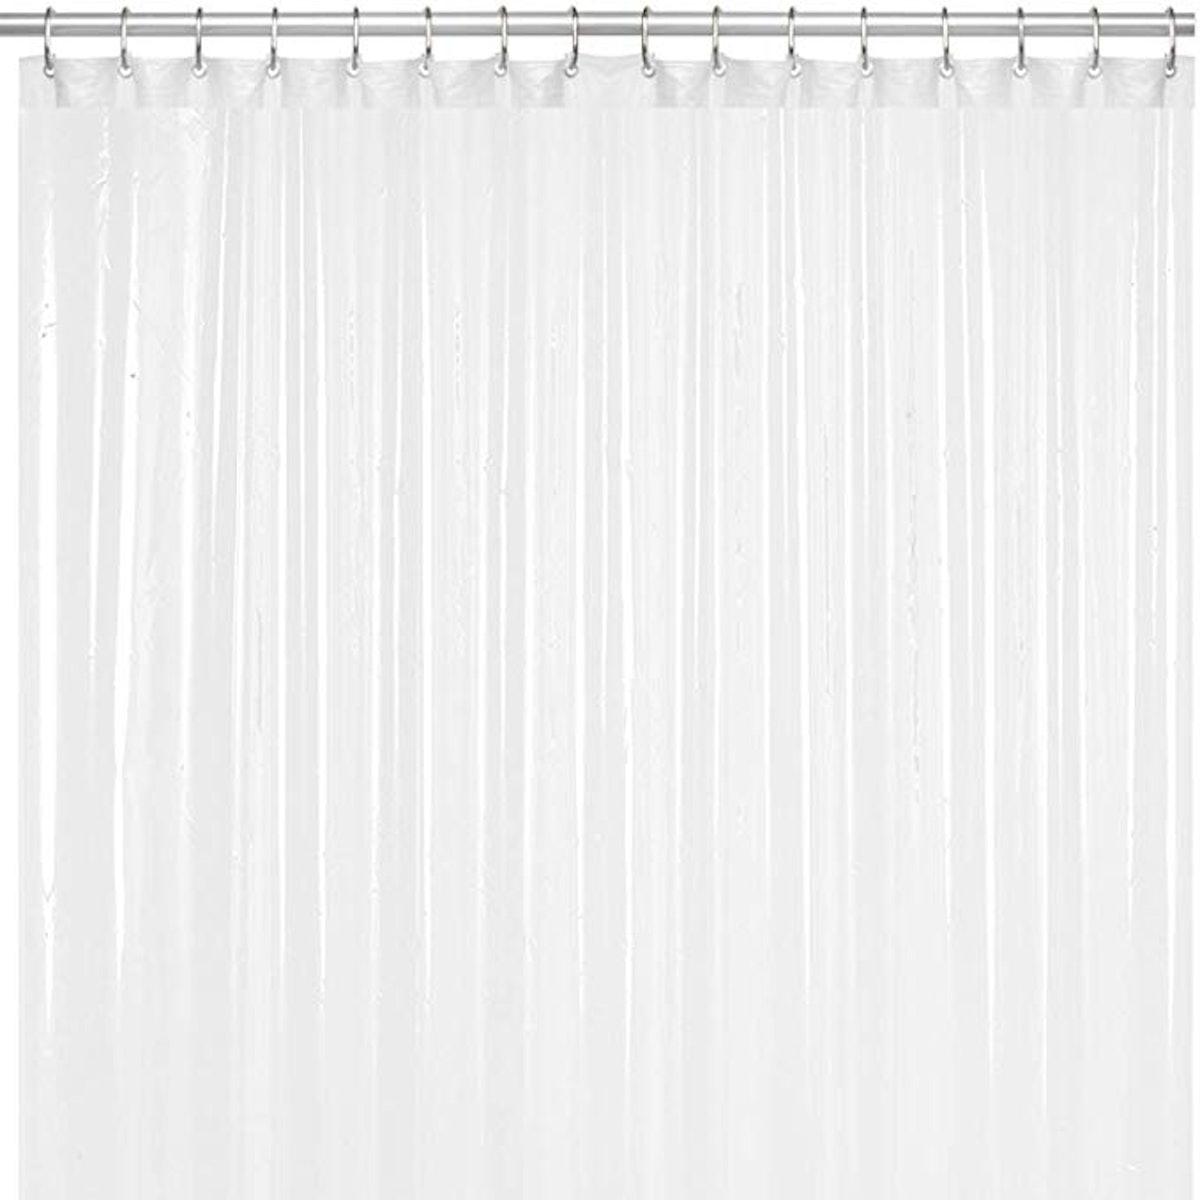 LiBa Anti-Microbial Shower Curtain Liner